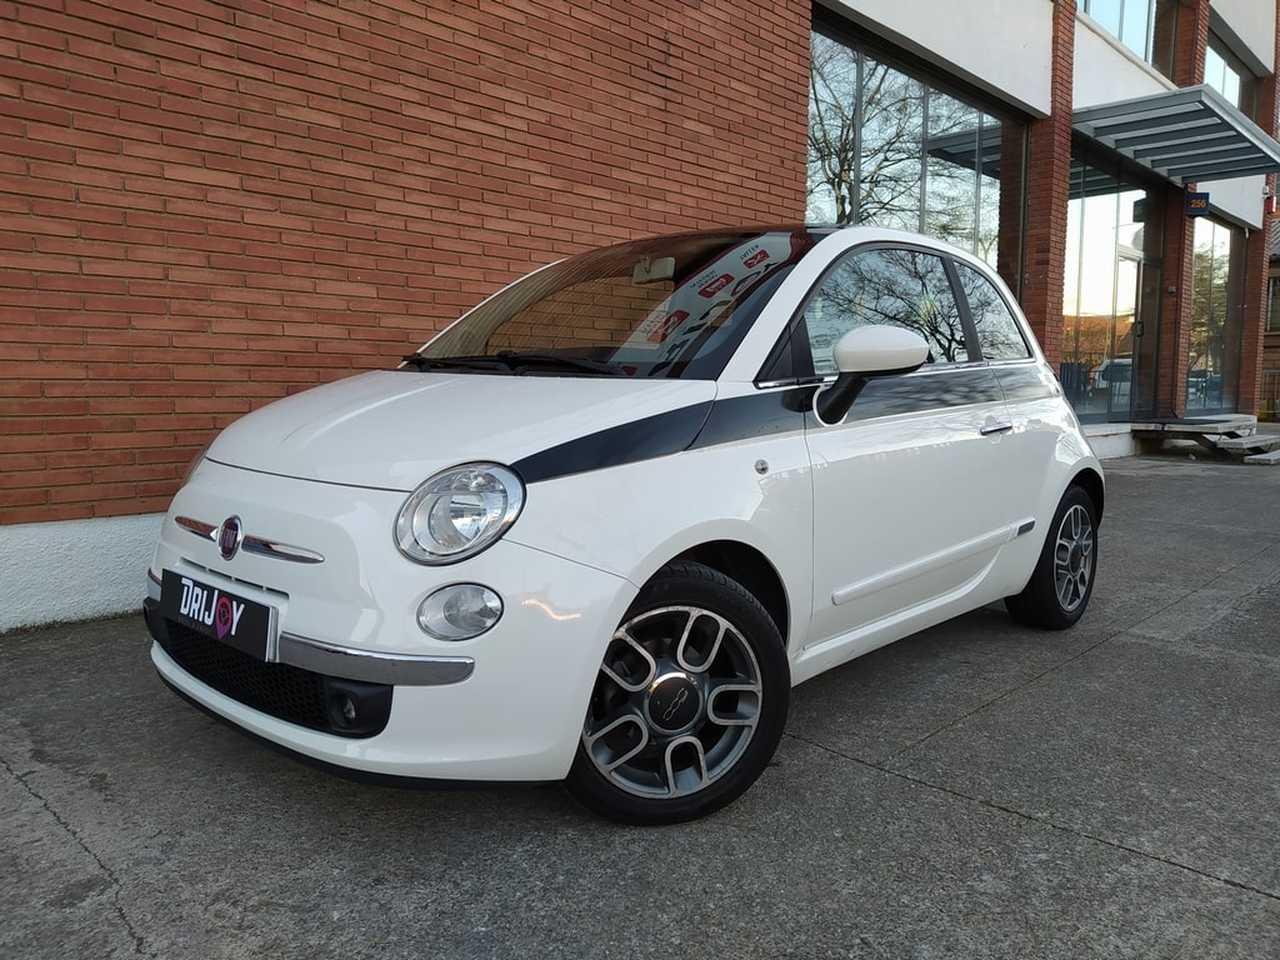 Fiat 500 1.2 8v 69 CV Sport 3p.   - Foto 1